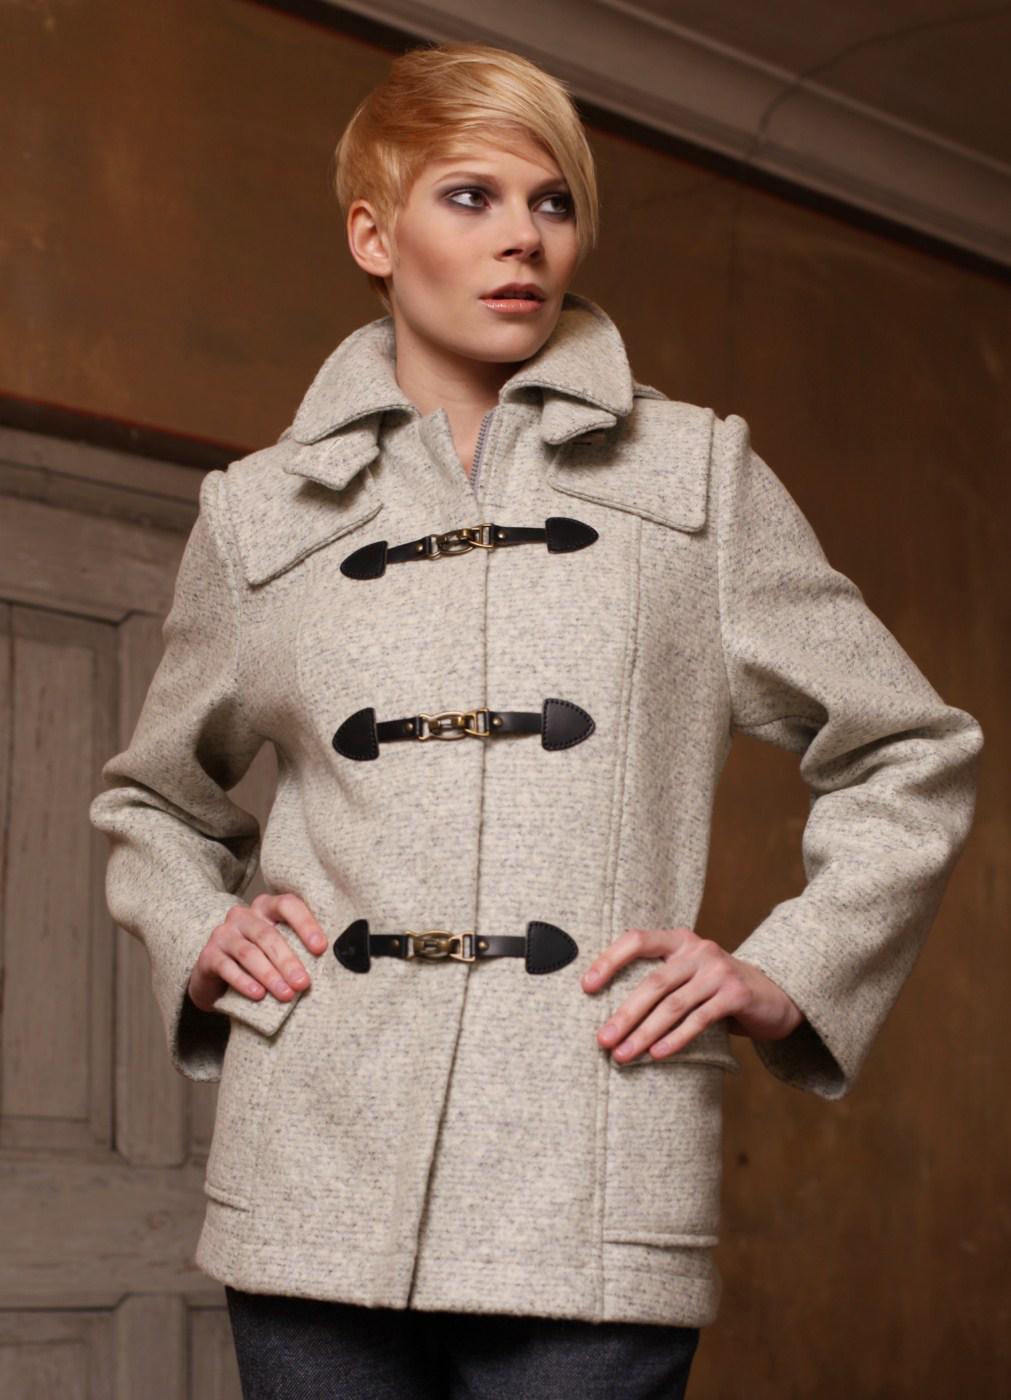 Schnittmuster - Jacke mit Dufflecoatdetails - 04-653 - Pattern Company